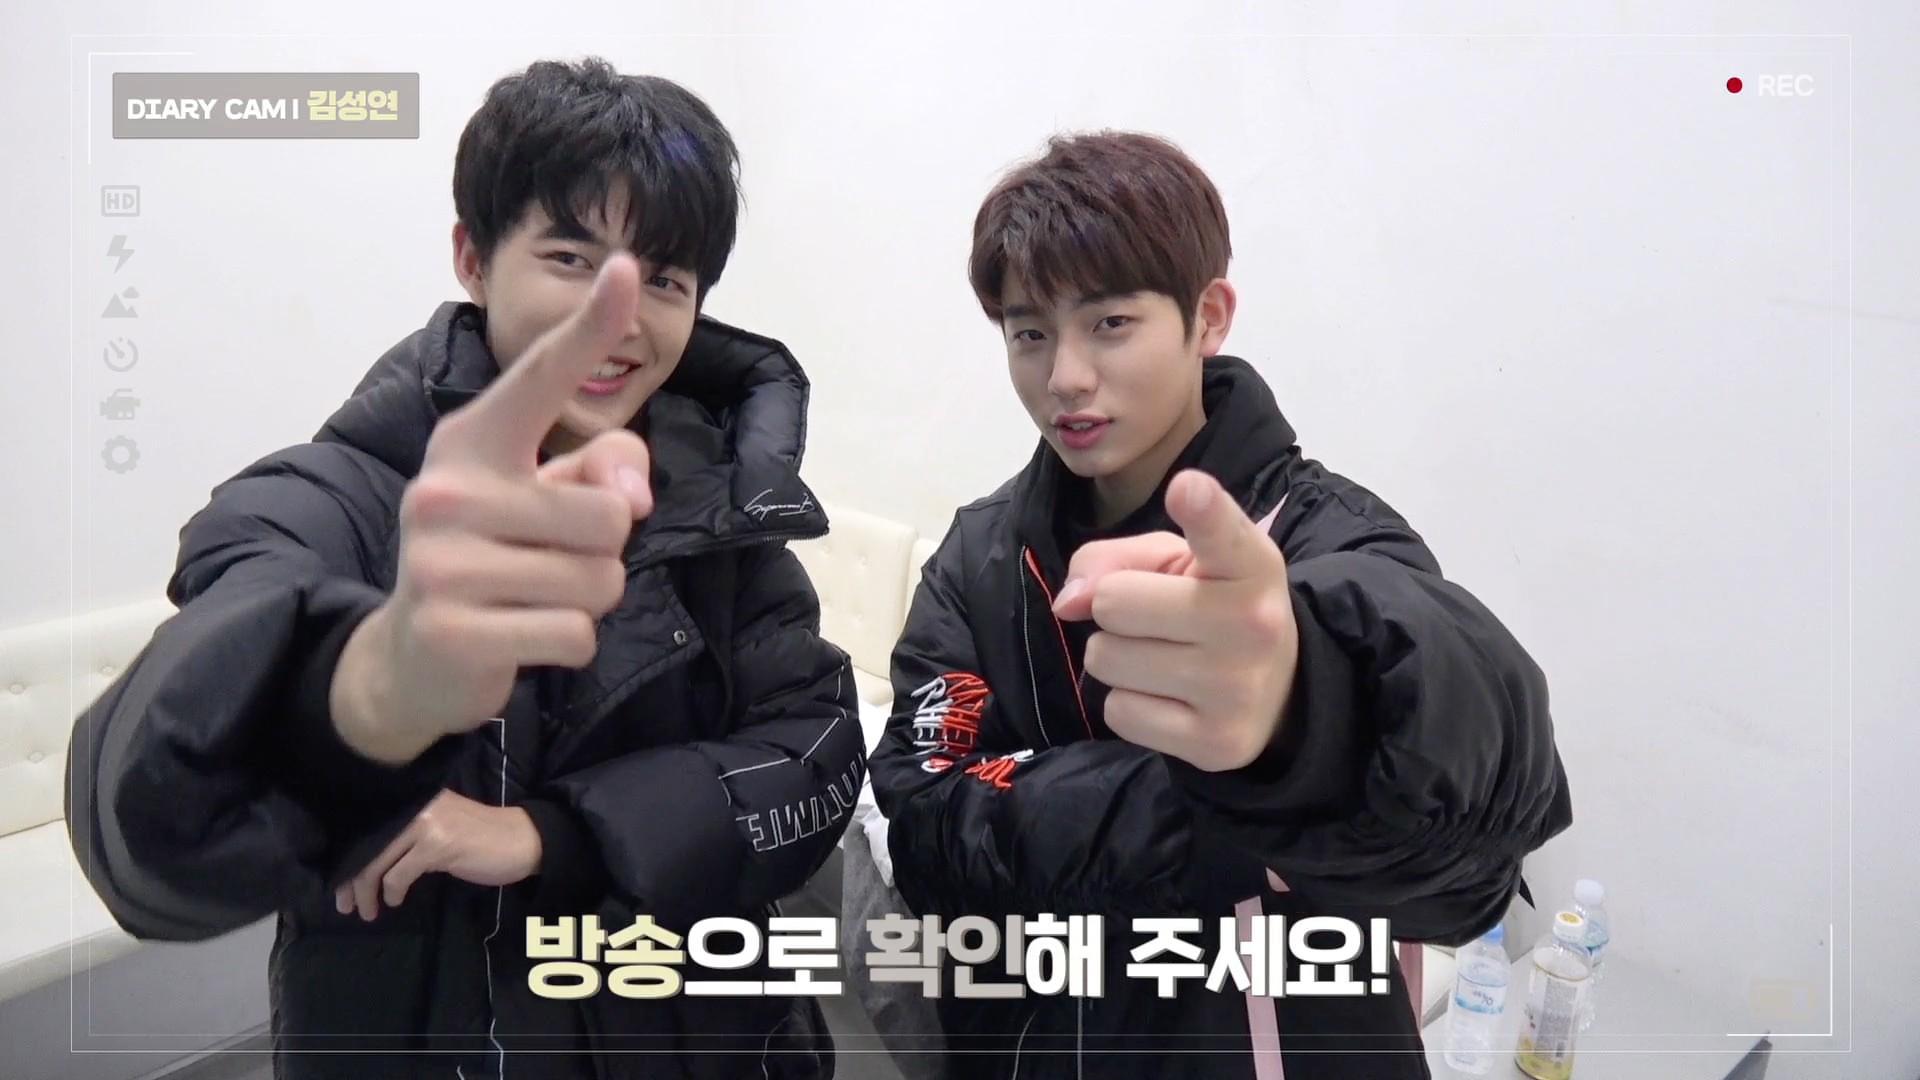 [DIARY CAM 3] 김성연 <KIM SUNGYEON> l YG보석함